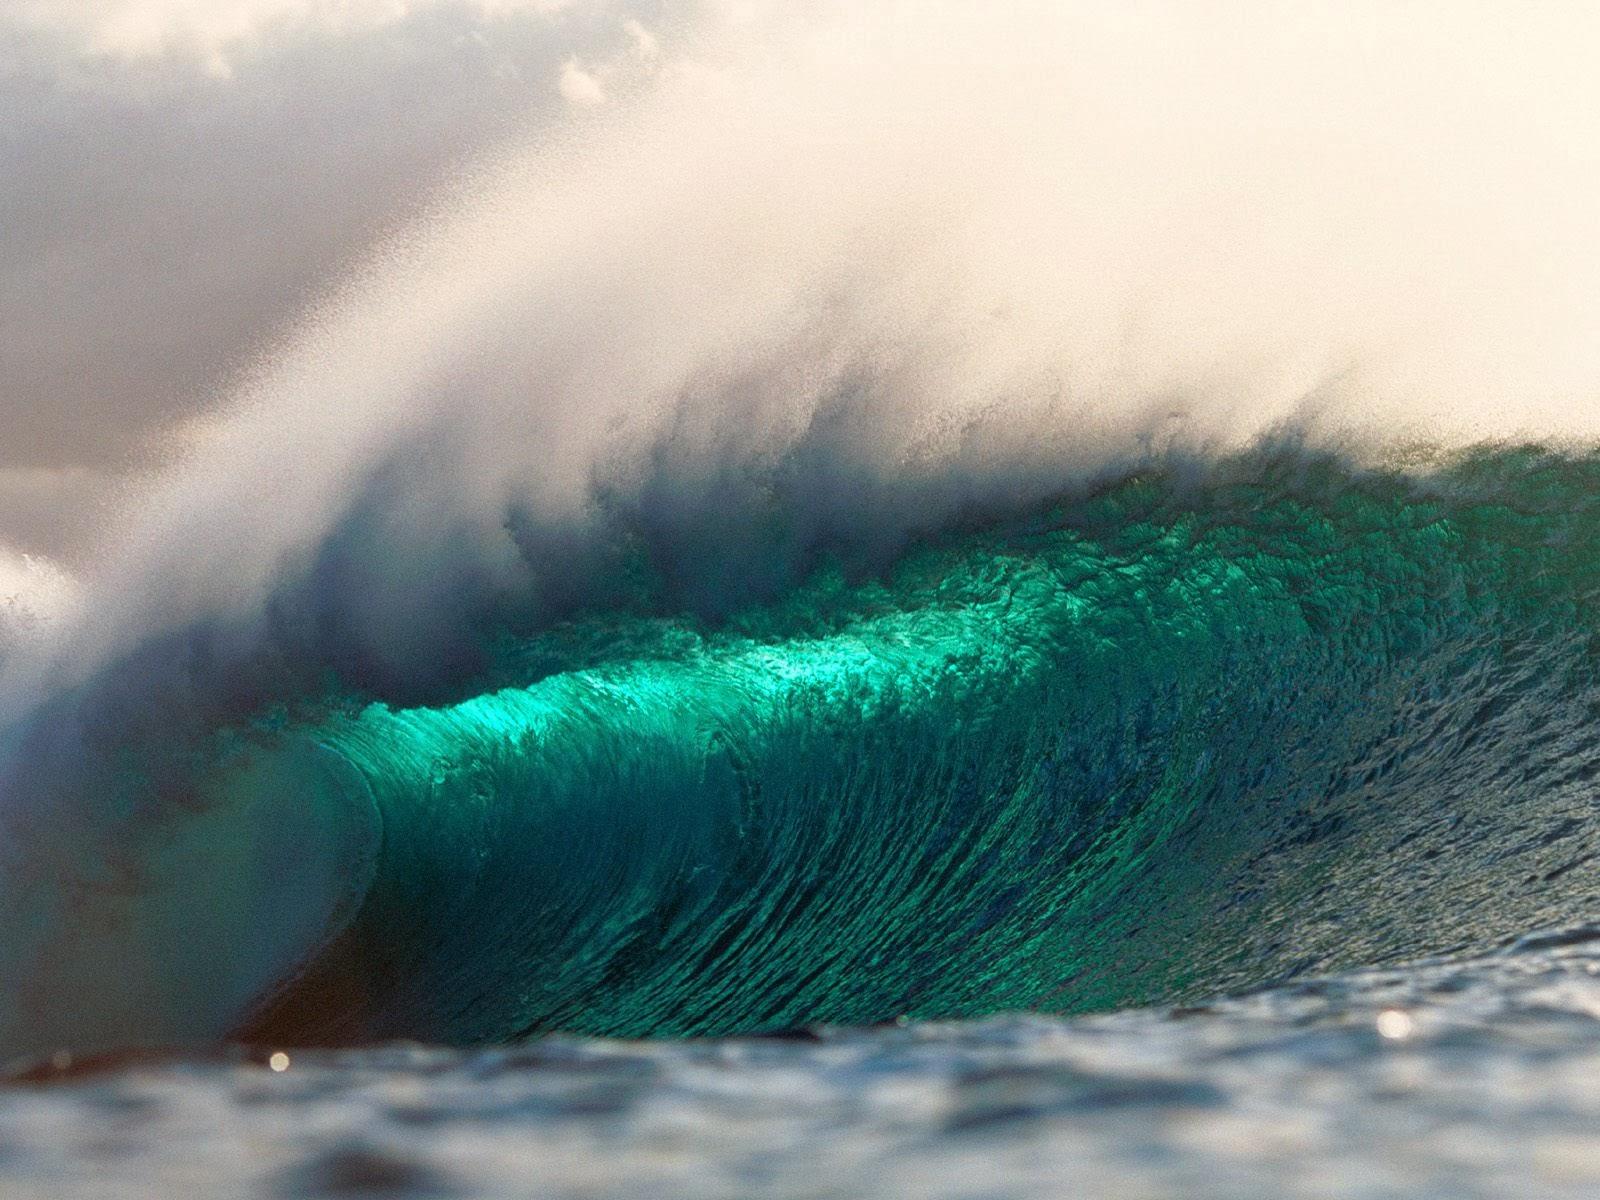 Ocean Waves Wallpaper HD Wallpapers 1600x1200